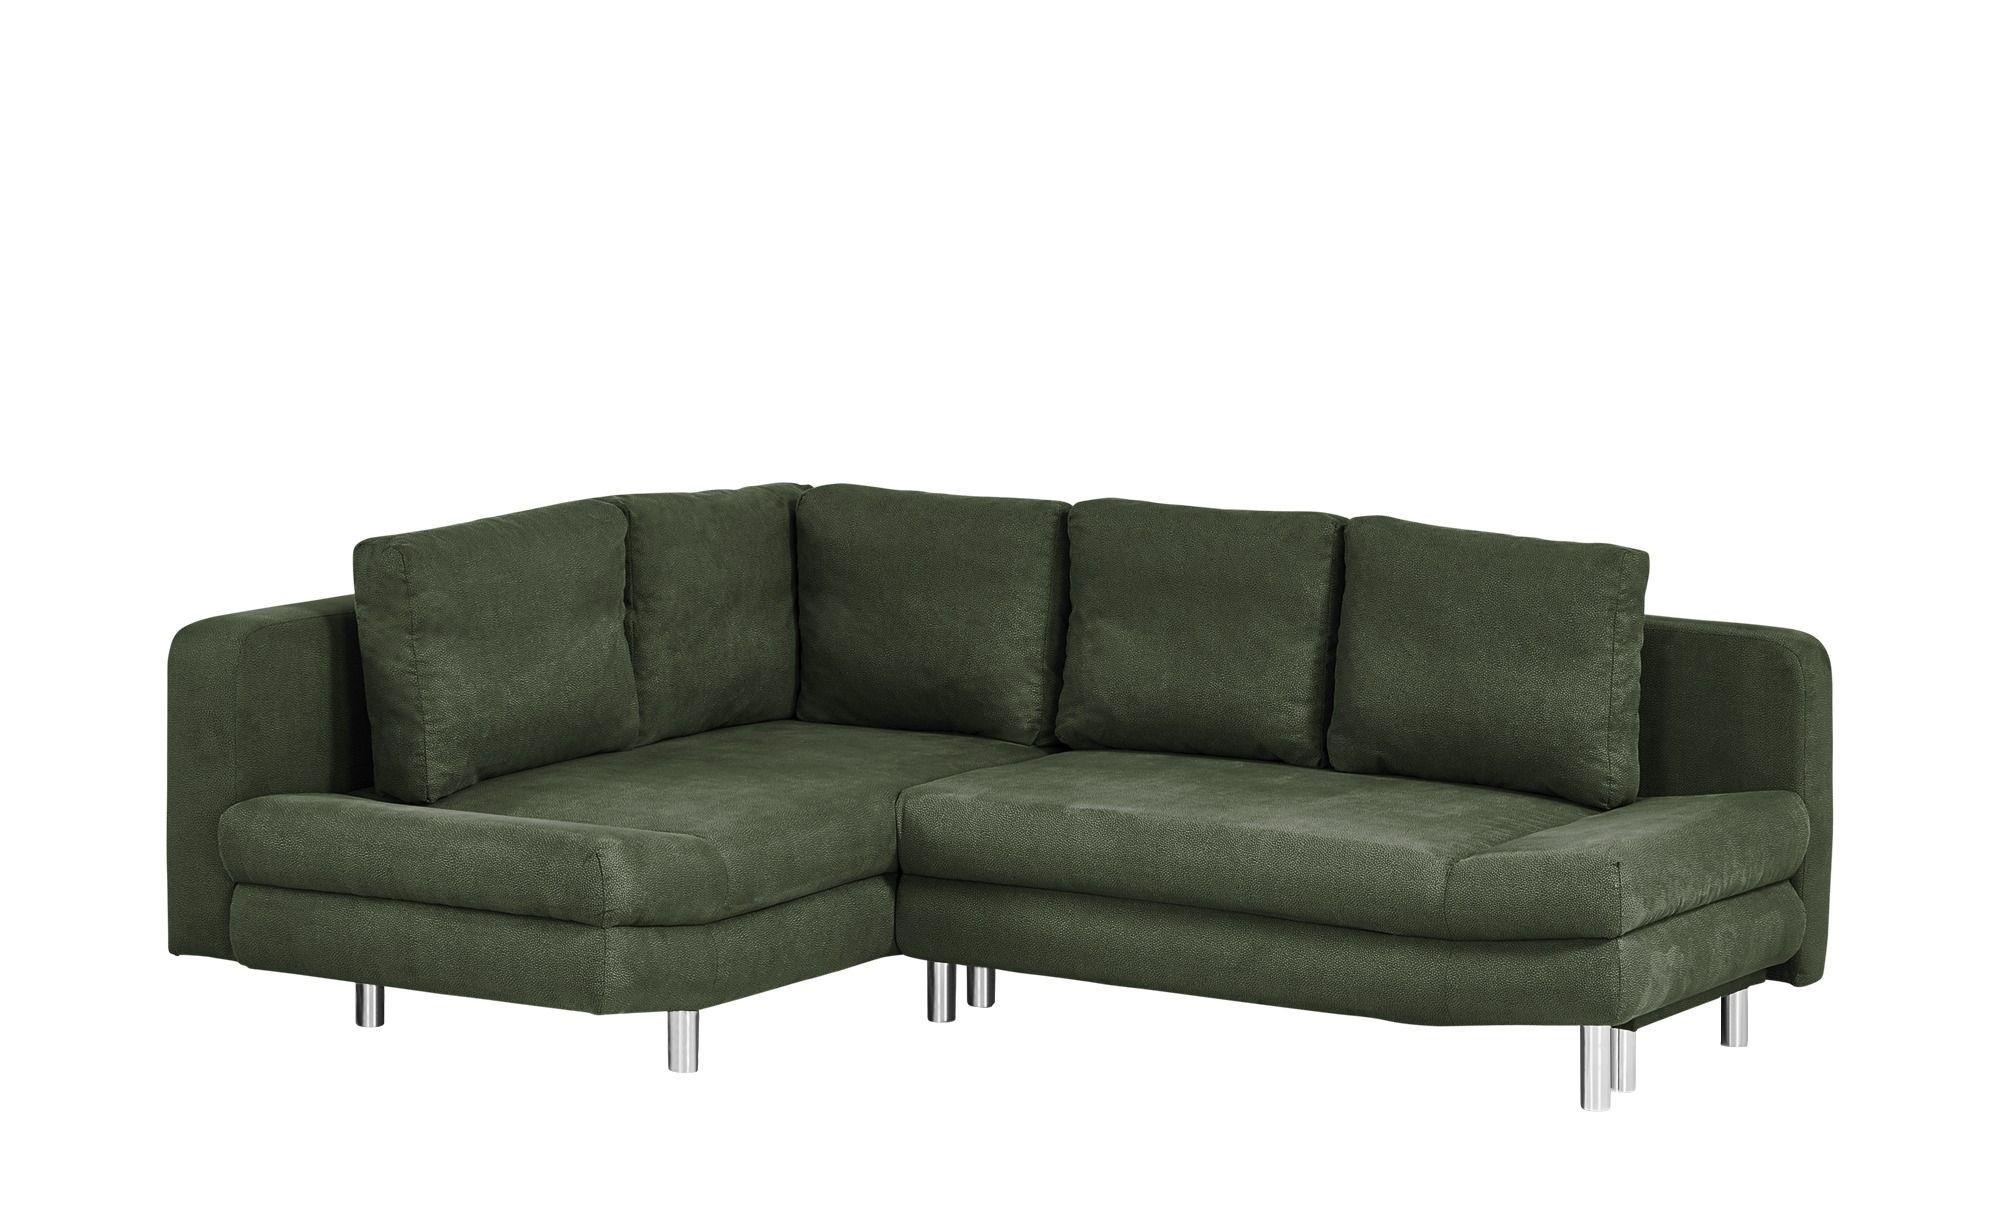 Smart Ecksofa Mila Gefunden Bei Mobel Hoffner Couch Furniture Home Decor